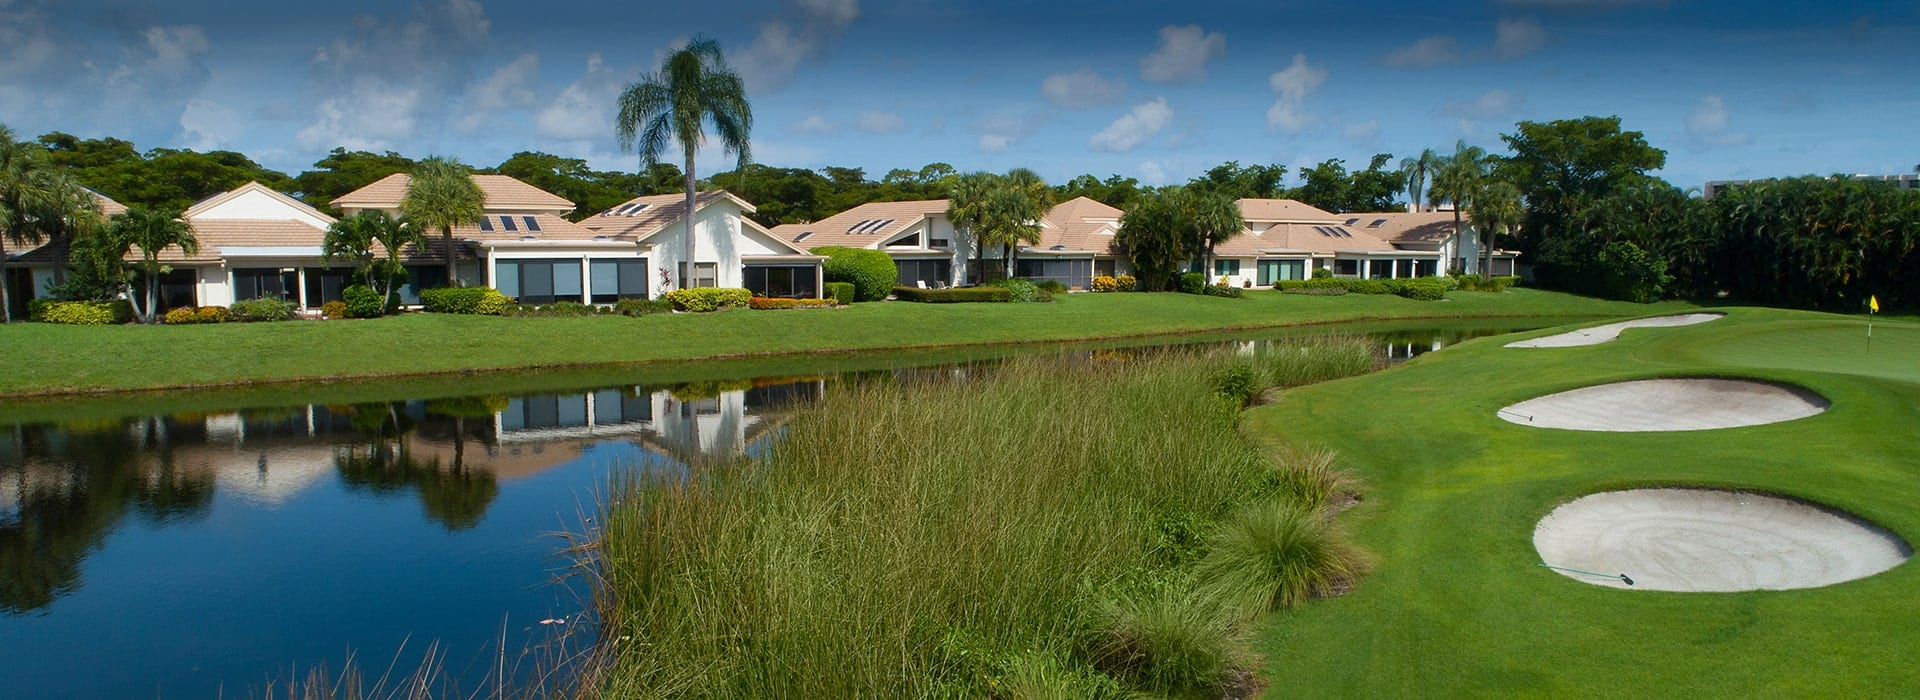 Boca West Waters Edge villa neighborhood with golf course views